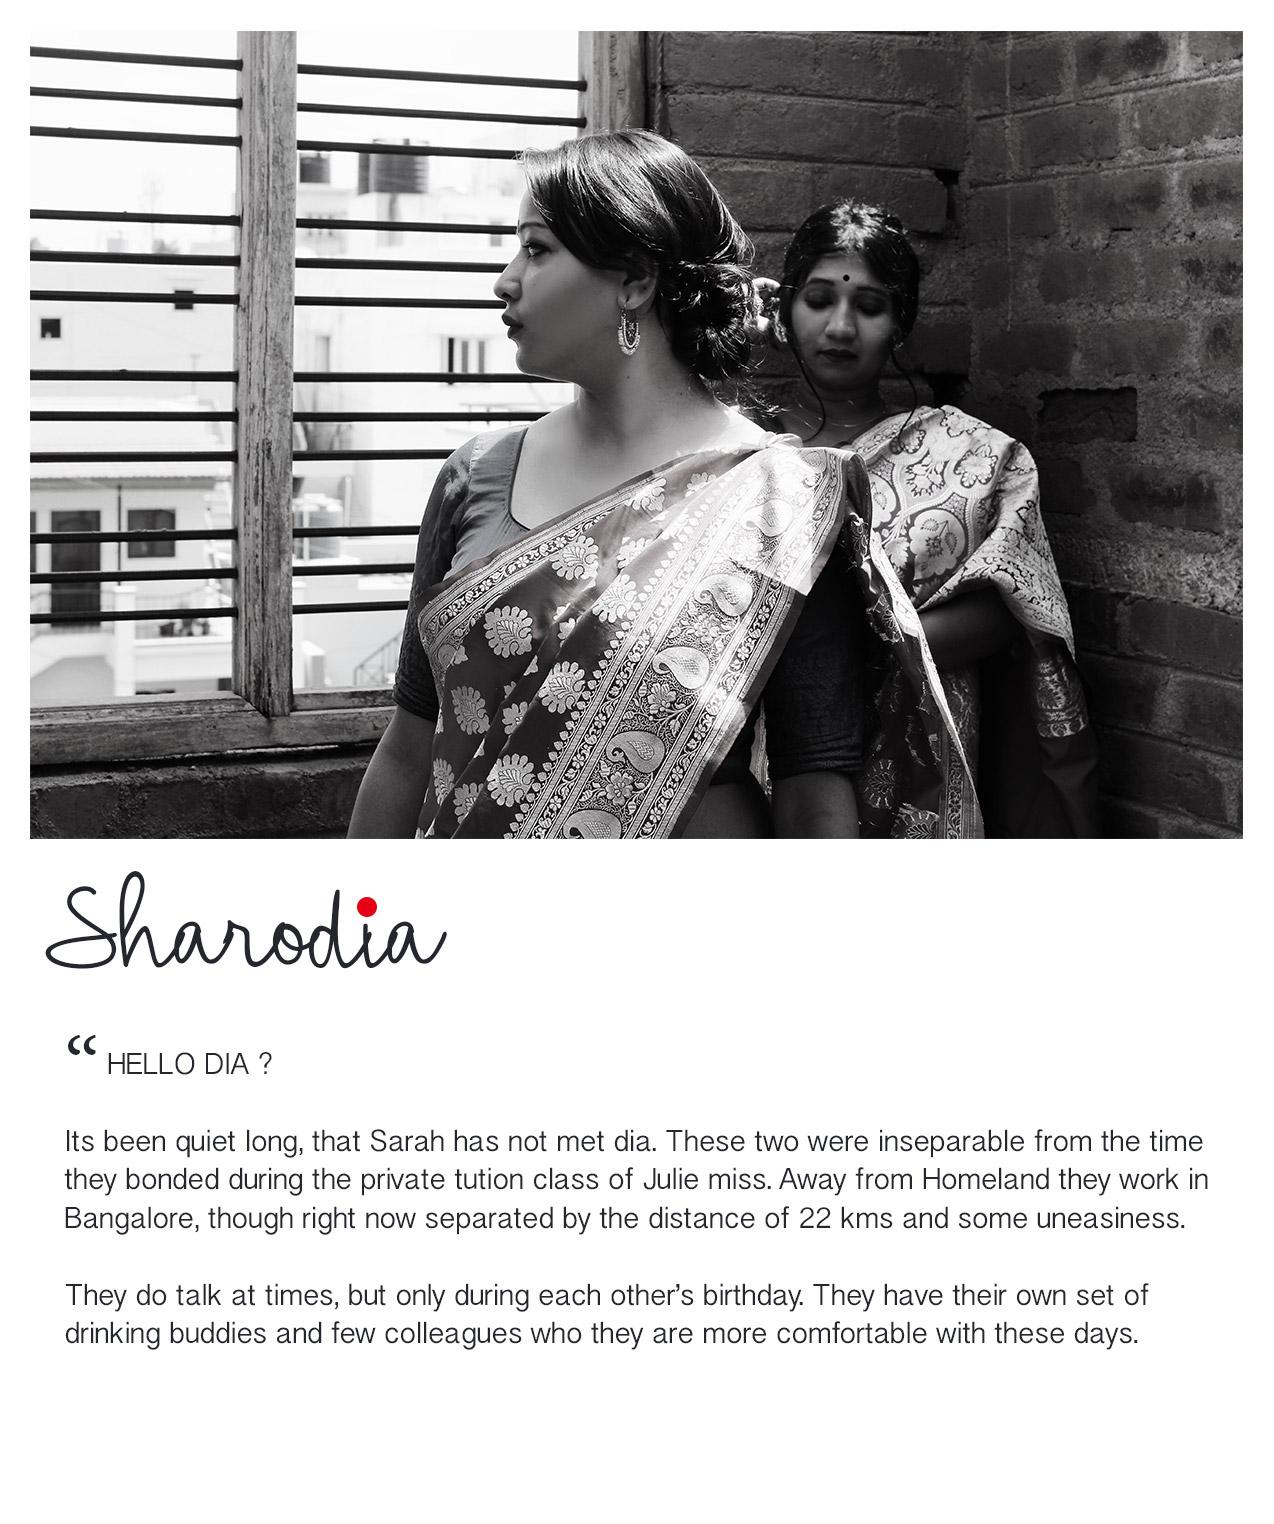 Sharodia - a short story image